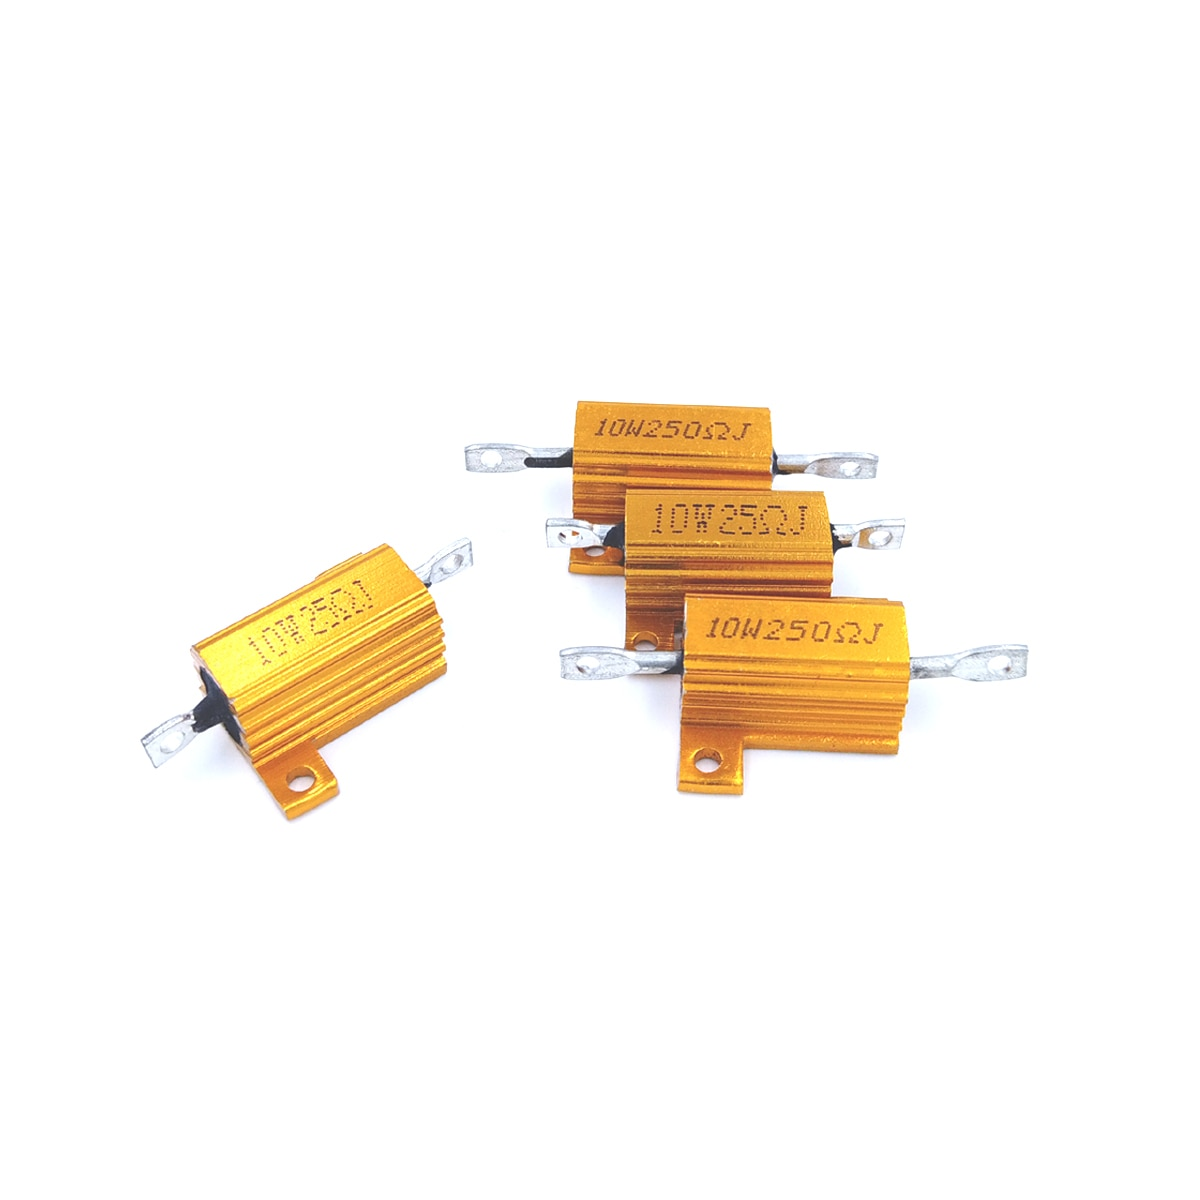 5 pçs 0.5r 0.5 0.5ohm 0.8r 0.8 0.8ohm r ohm 10w watt tom de ouro wirewound alumínio potência metal escudo caso resistência resistor rx24